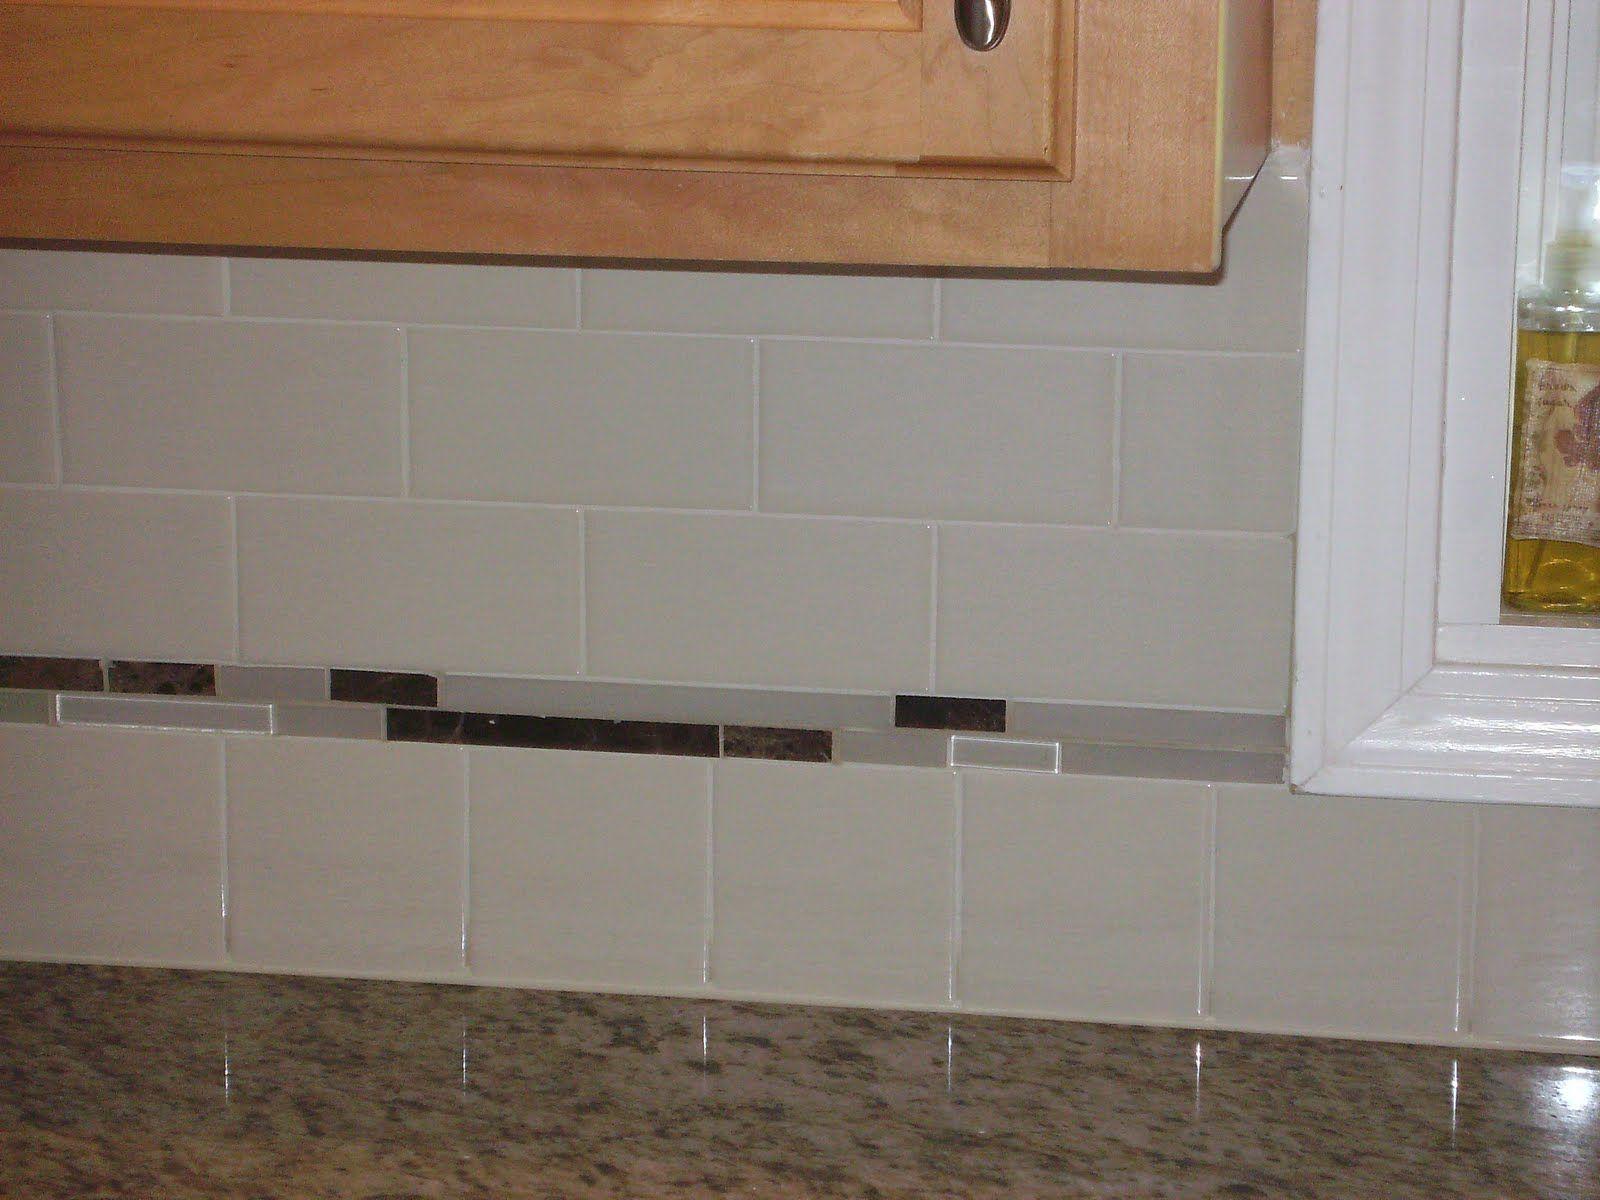 - Subway Tile Backsplash White Subway Tile Backsplash, Home Depot